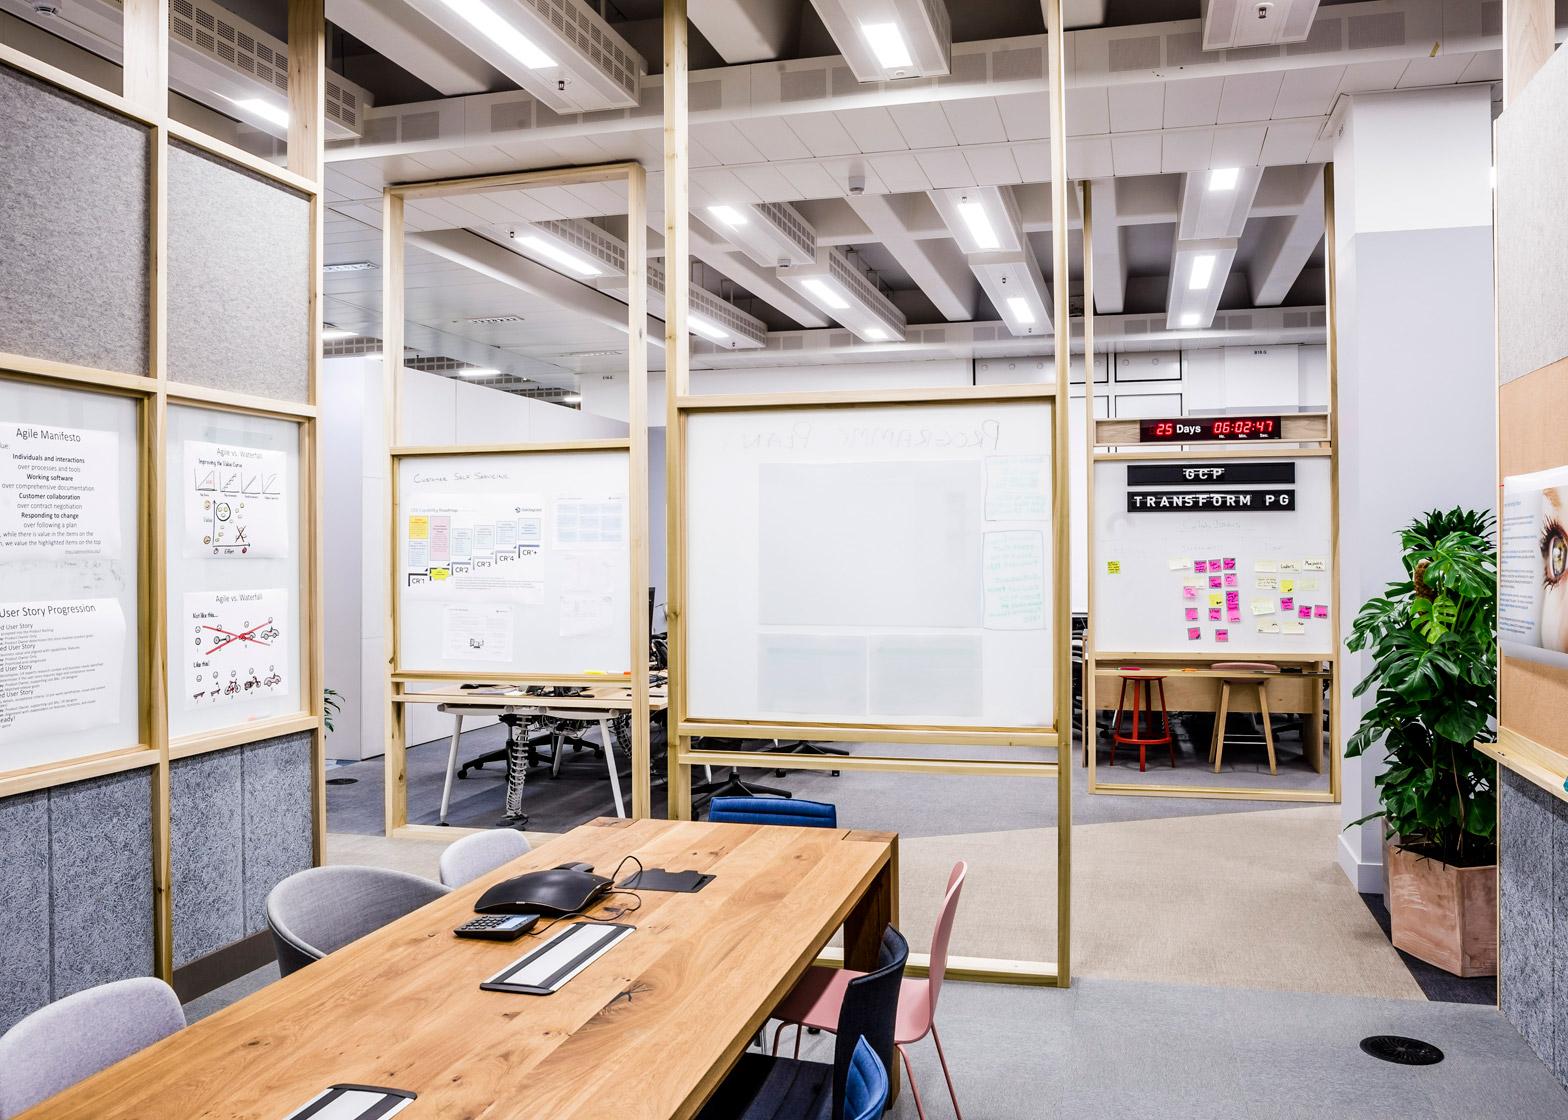 barclaycard-agile-workplace-APA-london-interior-design_dezeen_1568_0